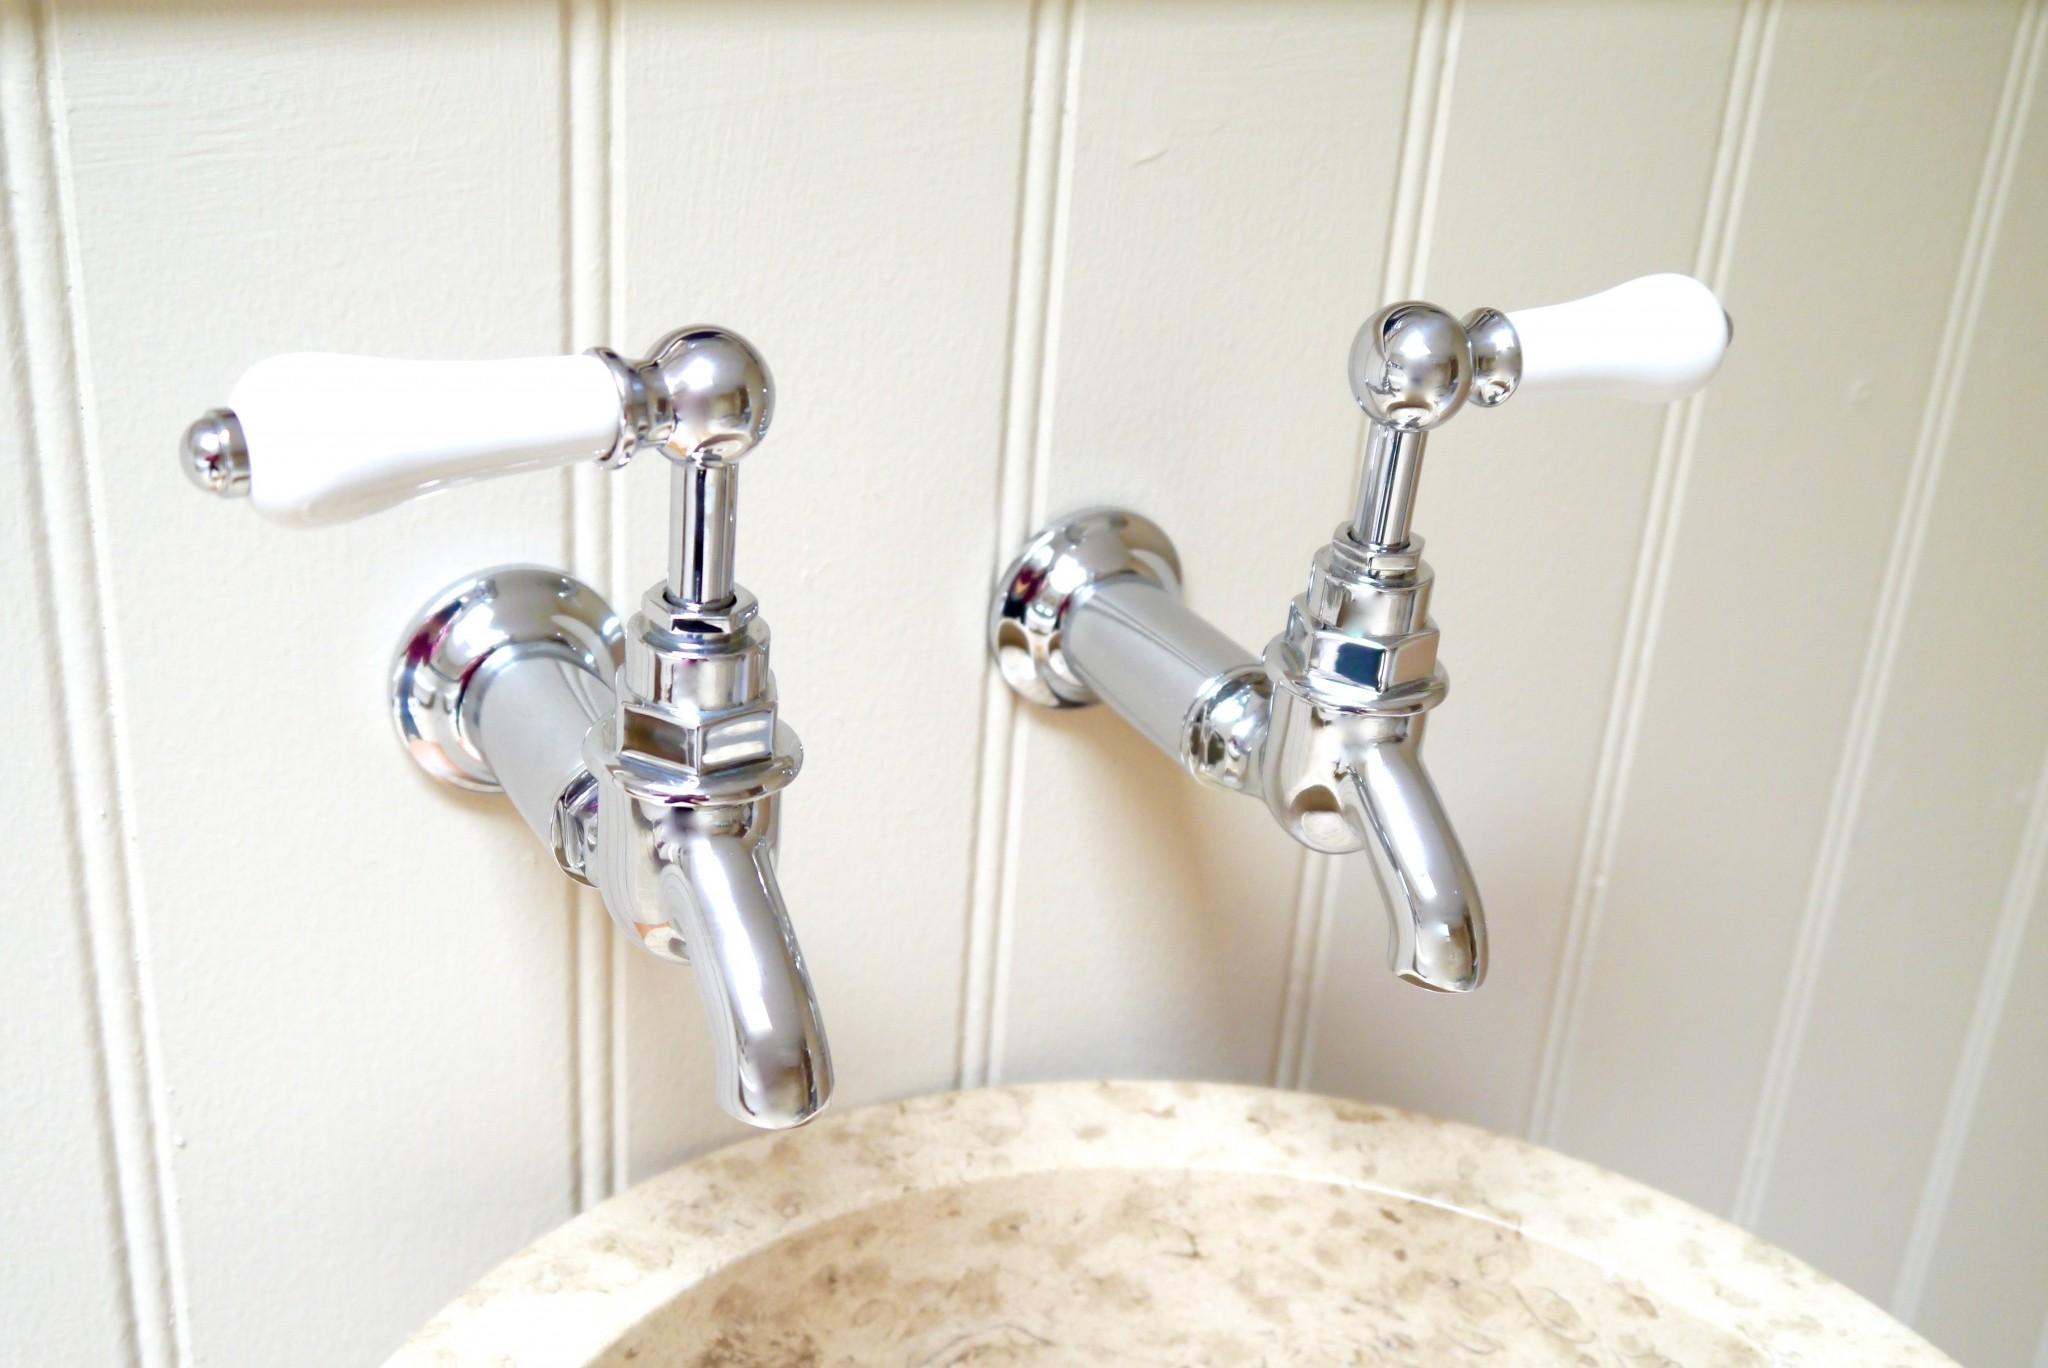 bib taps kitchen tap chrome faucet in wall tap white leaver bib taps industrial taps